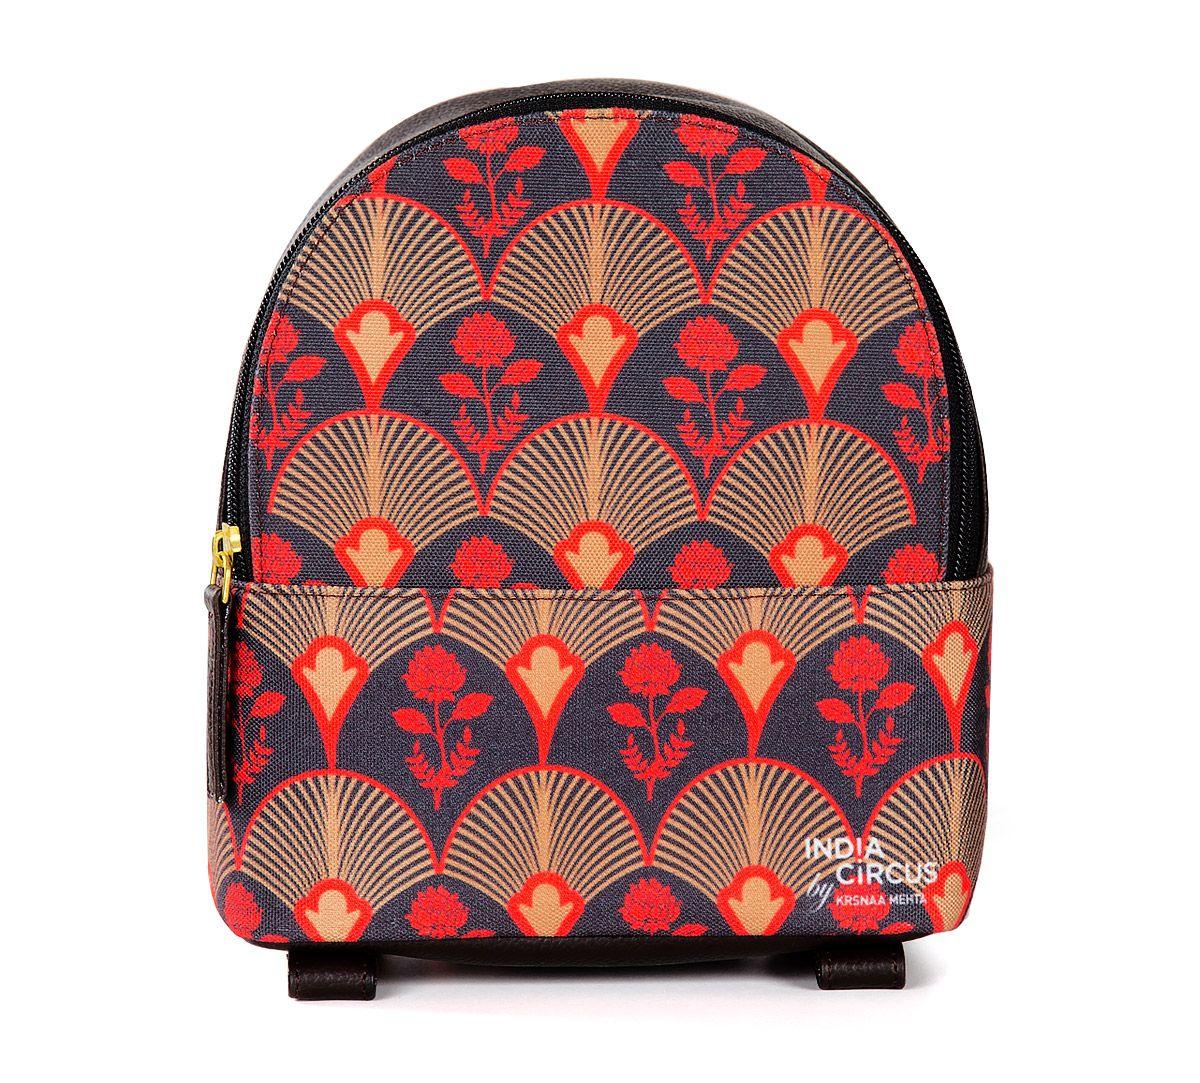 Fans of Blossom Backpack